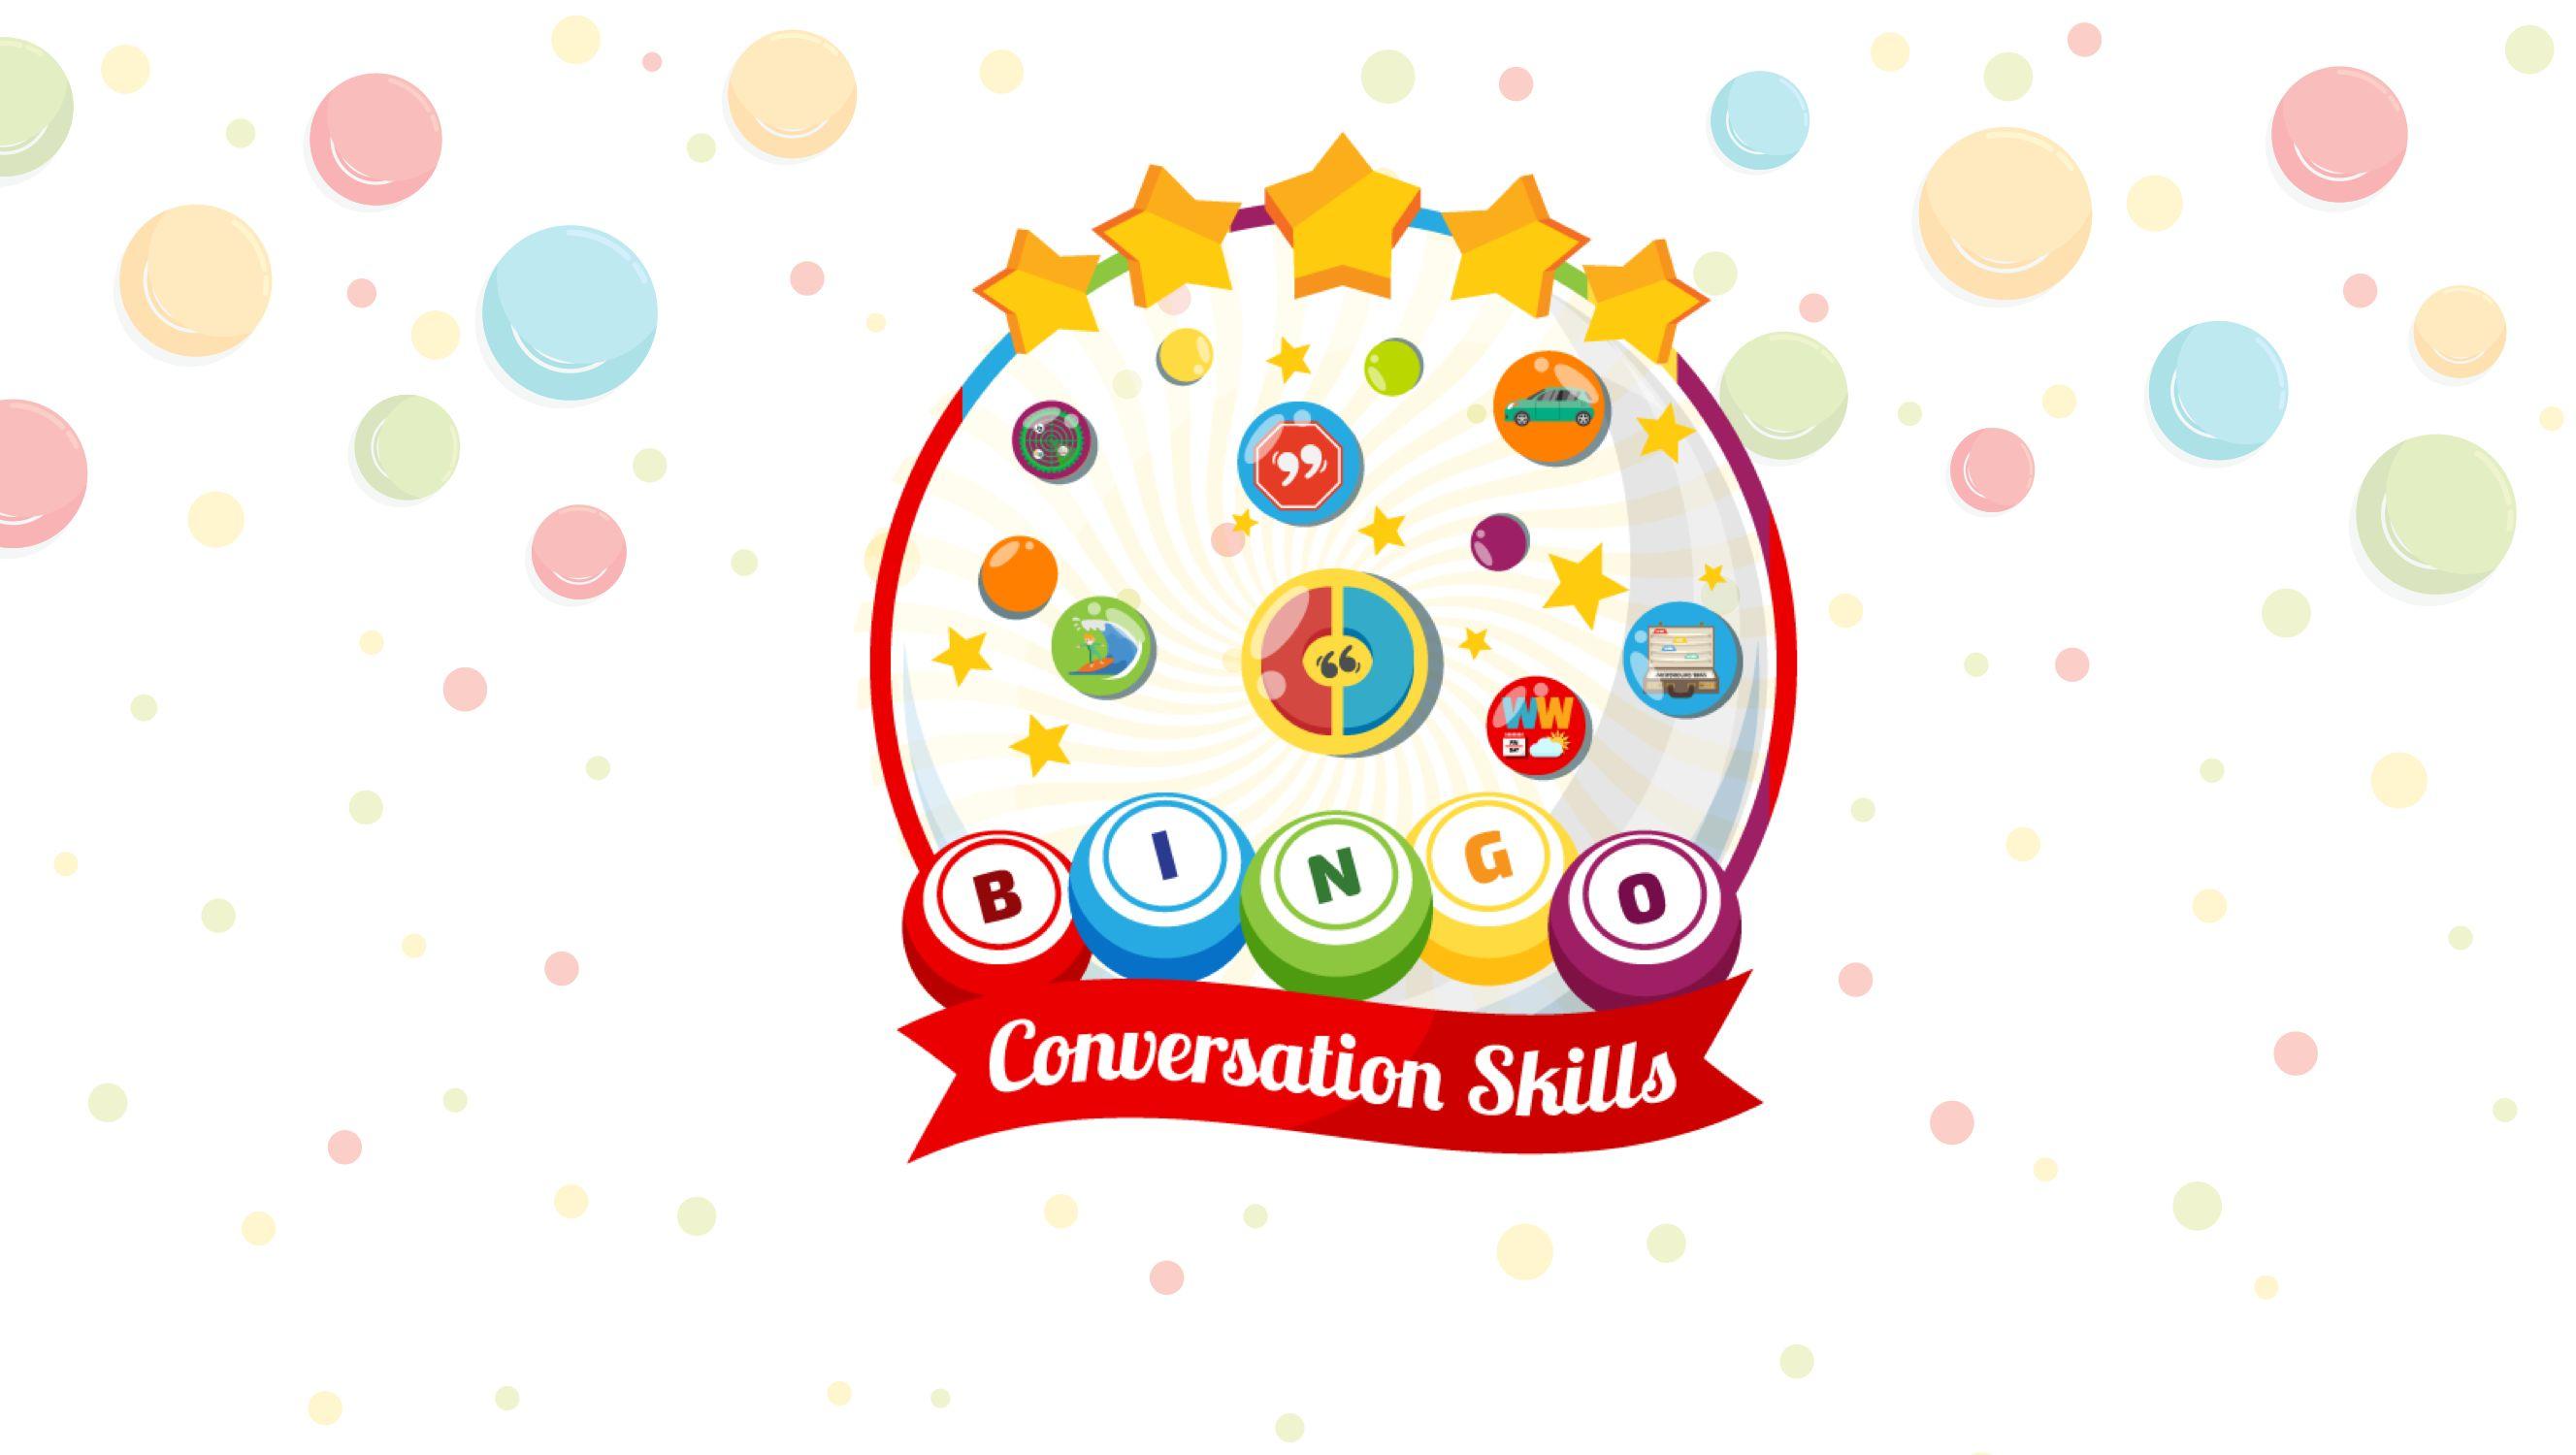 Bingo: Conversation Skills